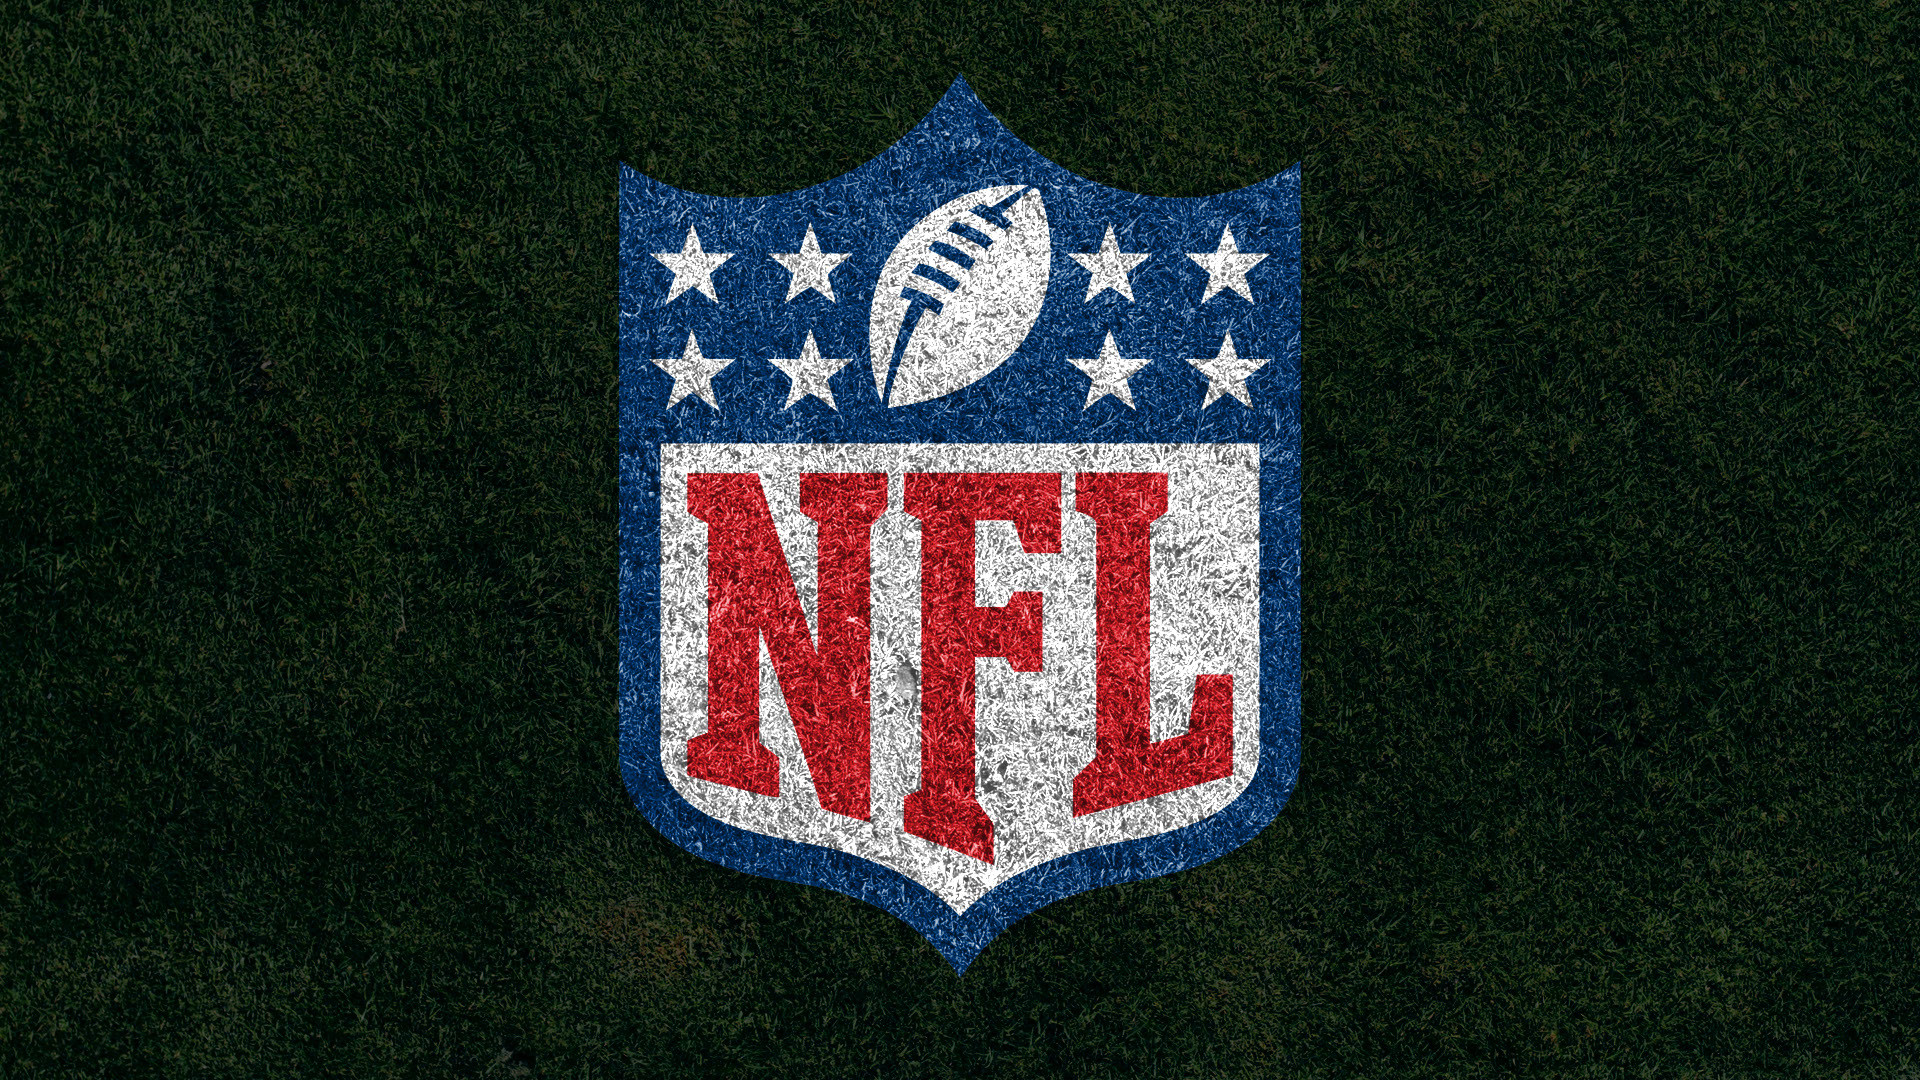 Res: 1920x1080, NFL 2017 Schedule Wallpaper Turf Logo Football